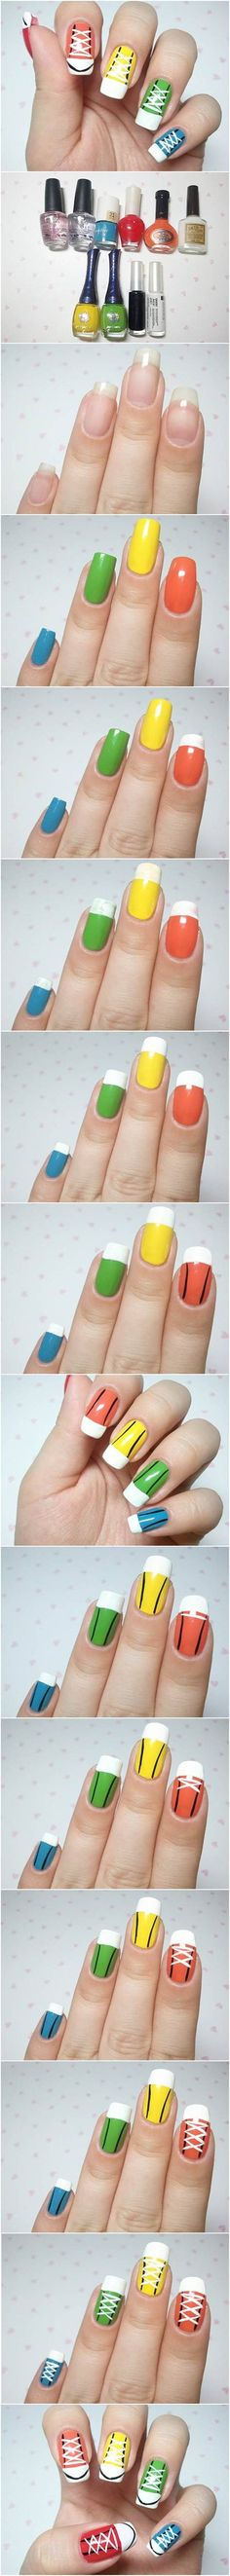 How to DIY Cute Converse Sneakers Nail Art #fashion #beauty #nail